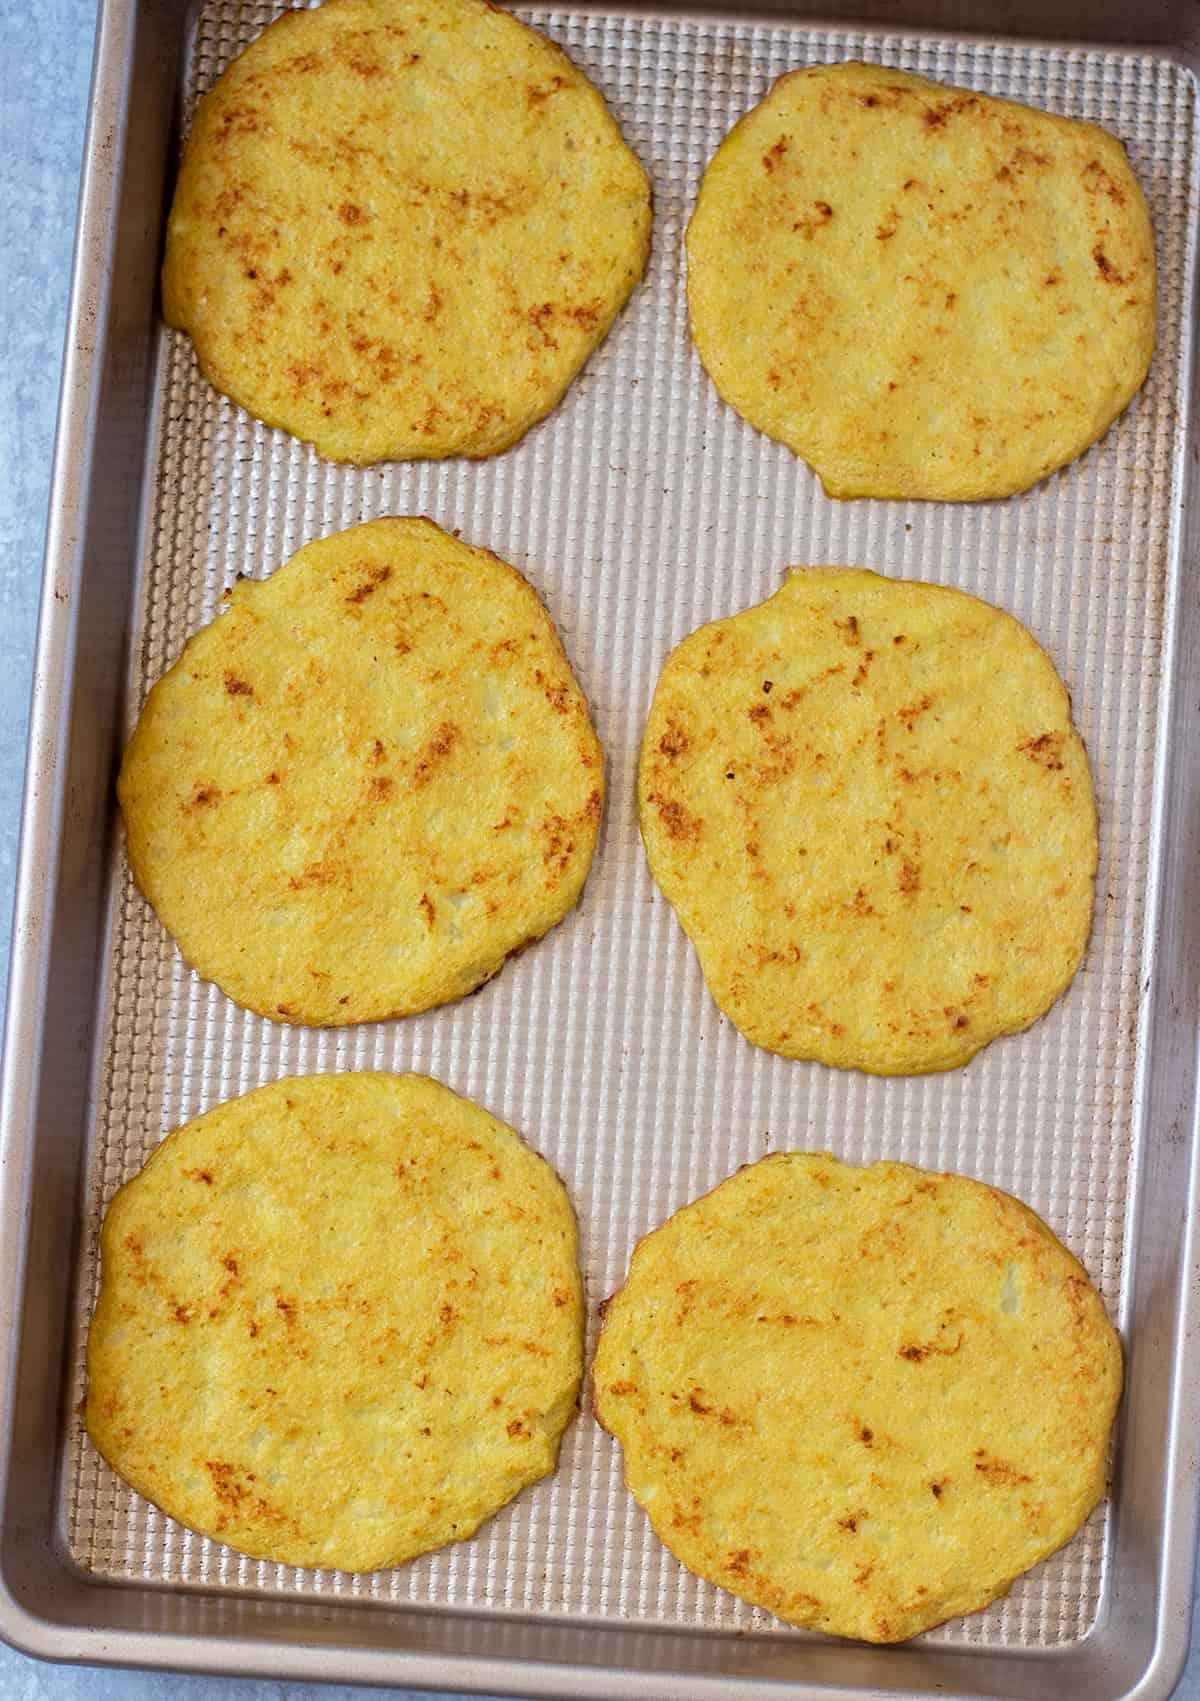 cauliflower tortillas on a gold baking pan after cooking.